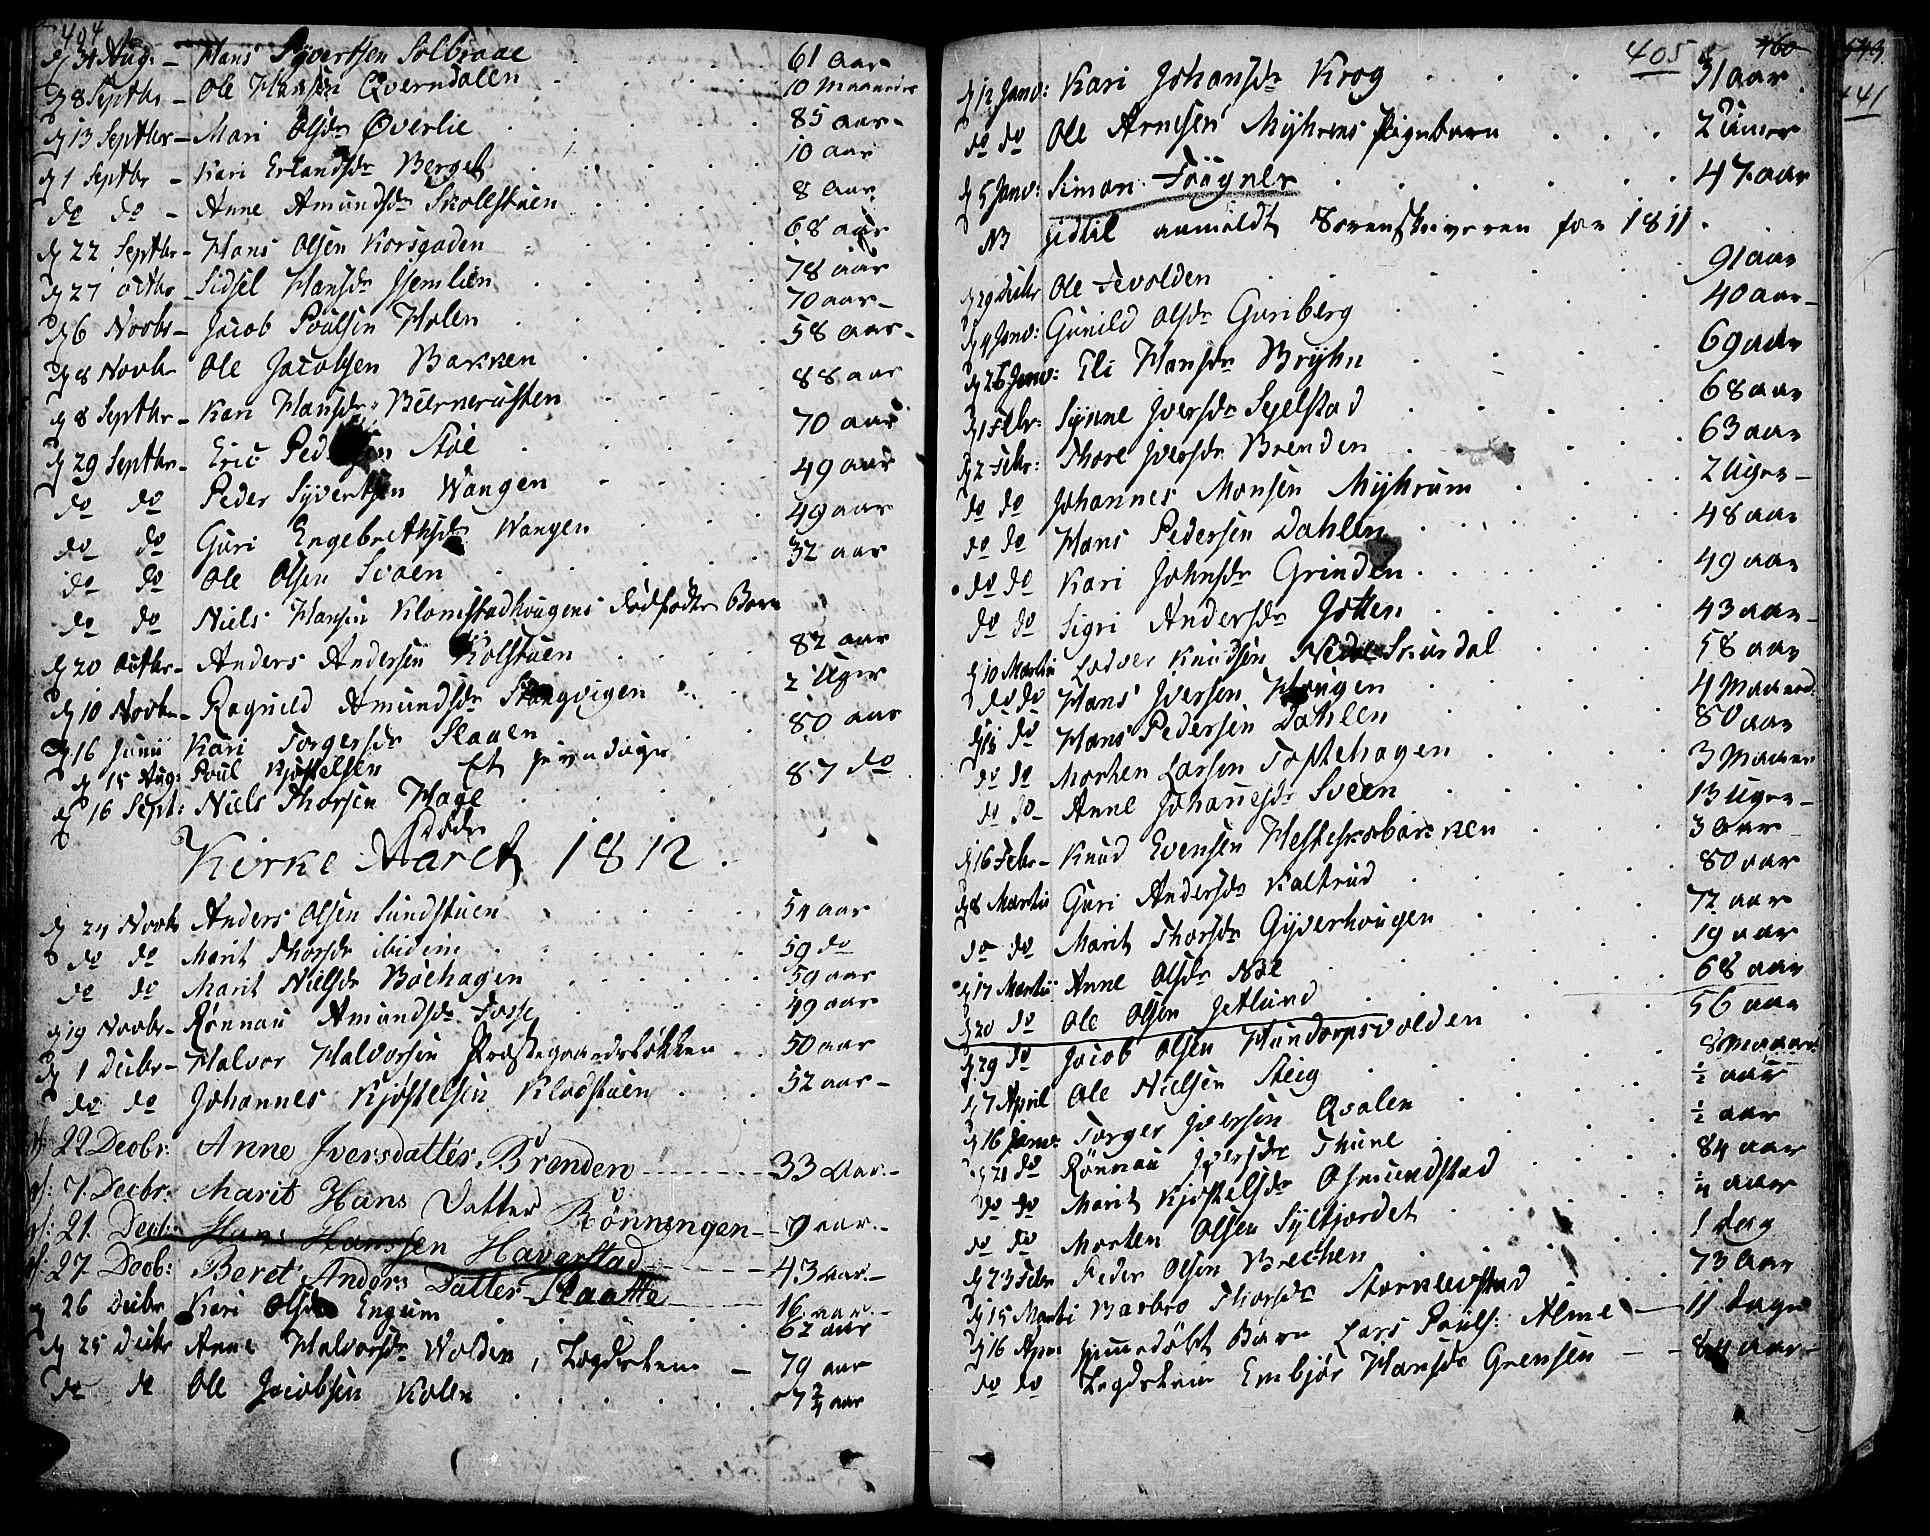 SAH, Fron prestekontor, H/Ha/Haa/L0001: Ministerialbok nr. 1, 1799-1816, s. 404-405